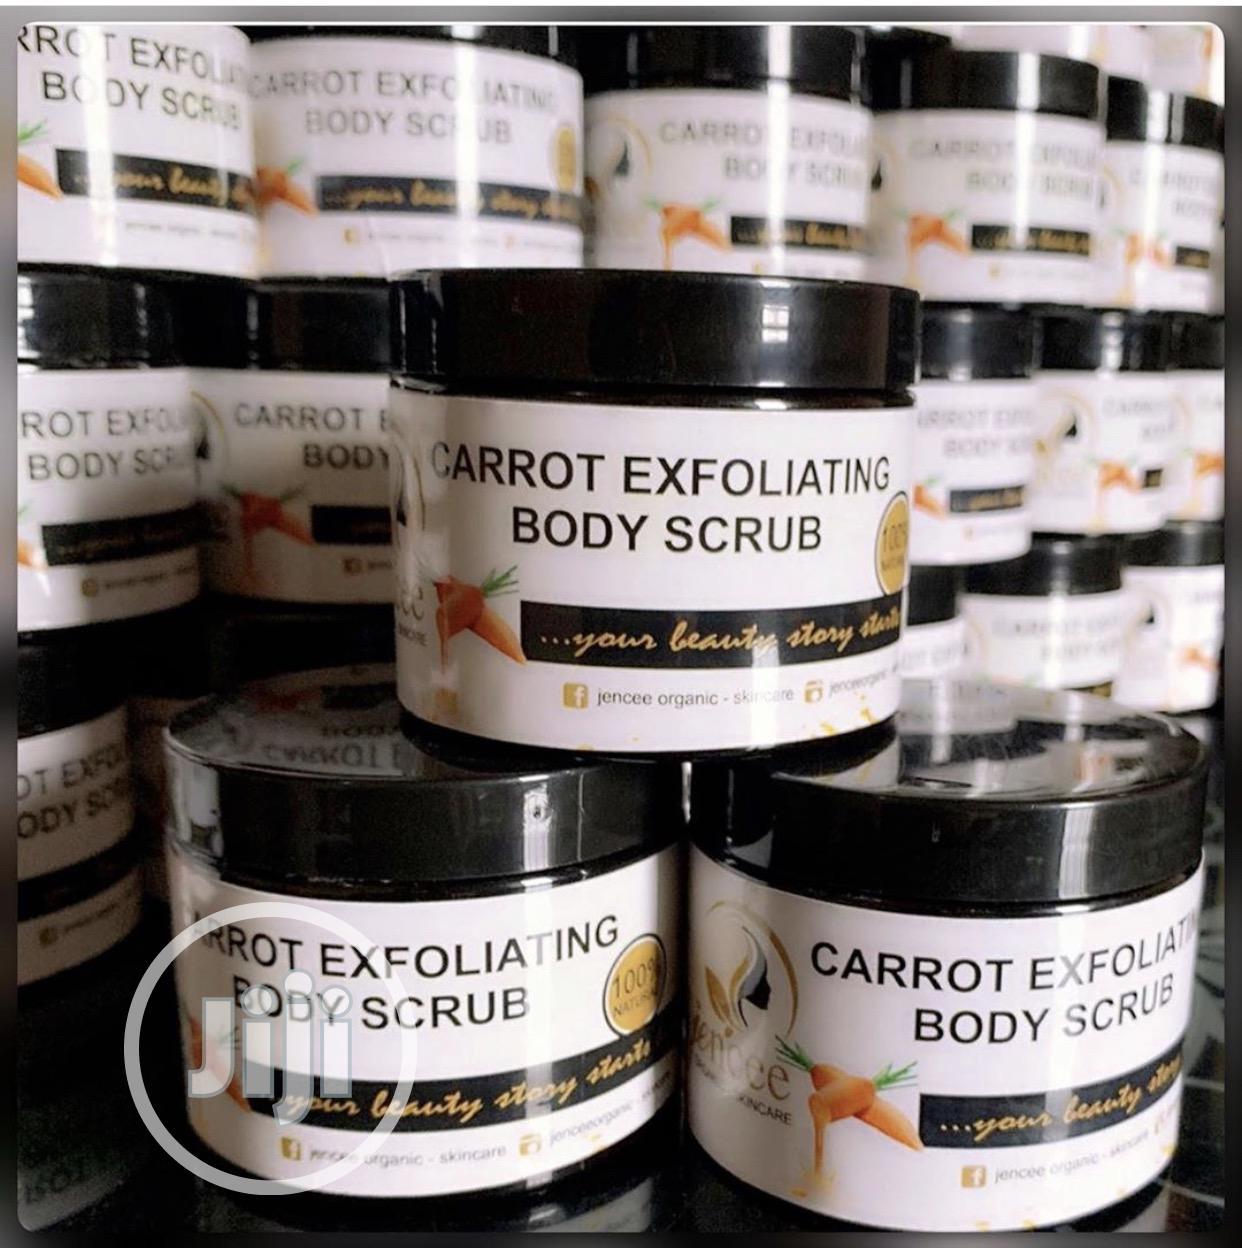 Carrot Exfoliating Body Scrub